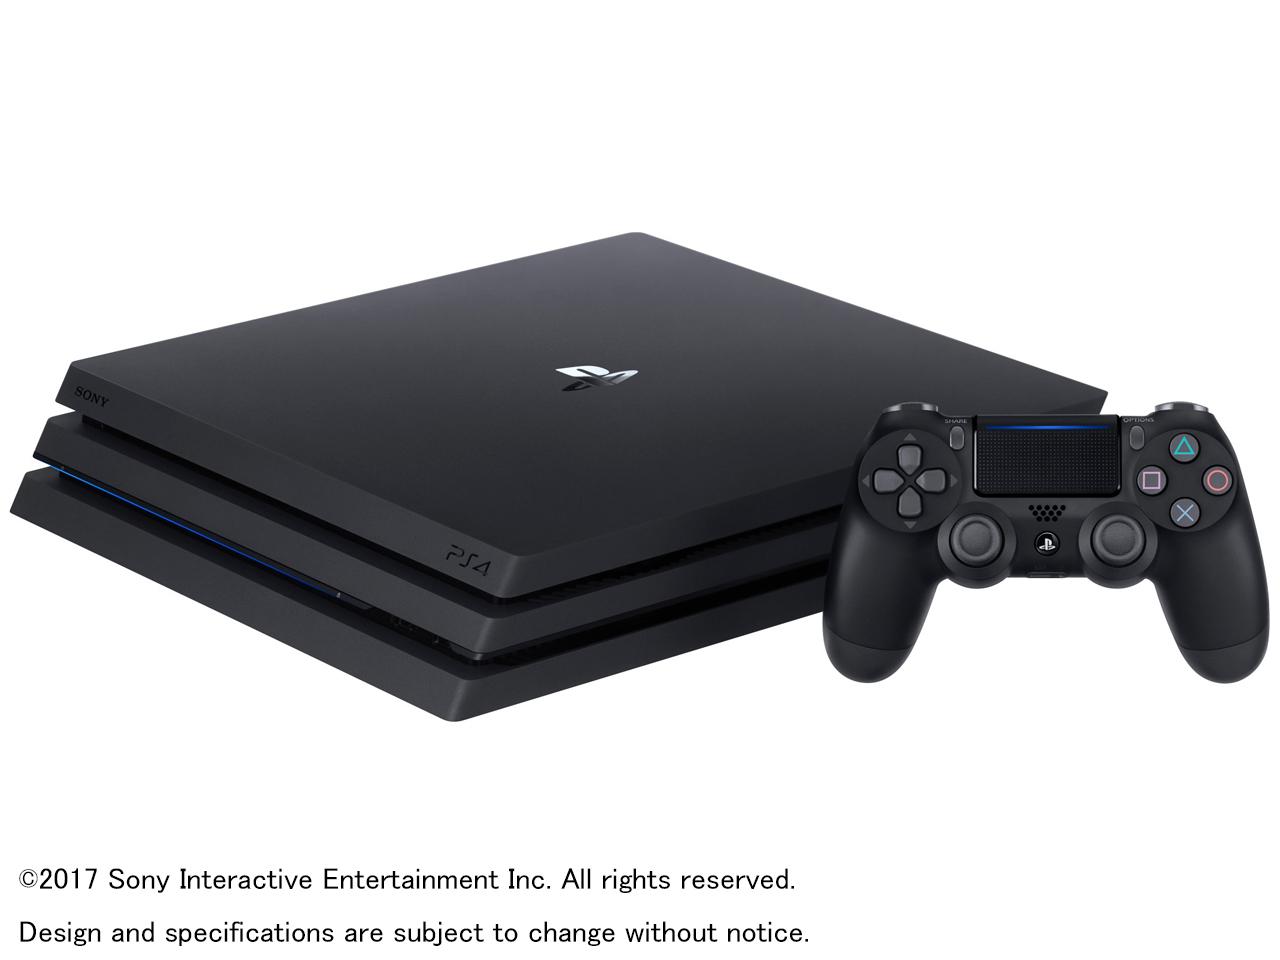 SONY(ソニー) プレイステーション4 Pro HDD 1TB ジェット・ブラック CUH-7100BB01 ゲーム機/